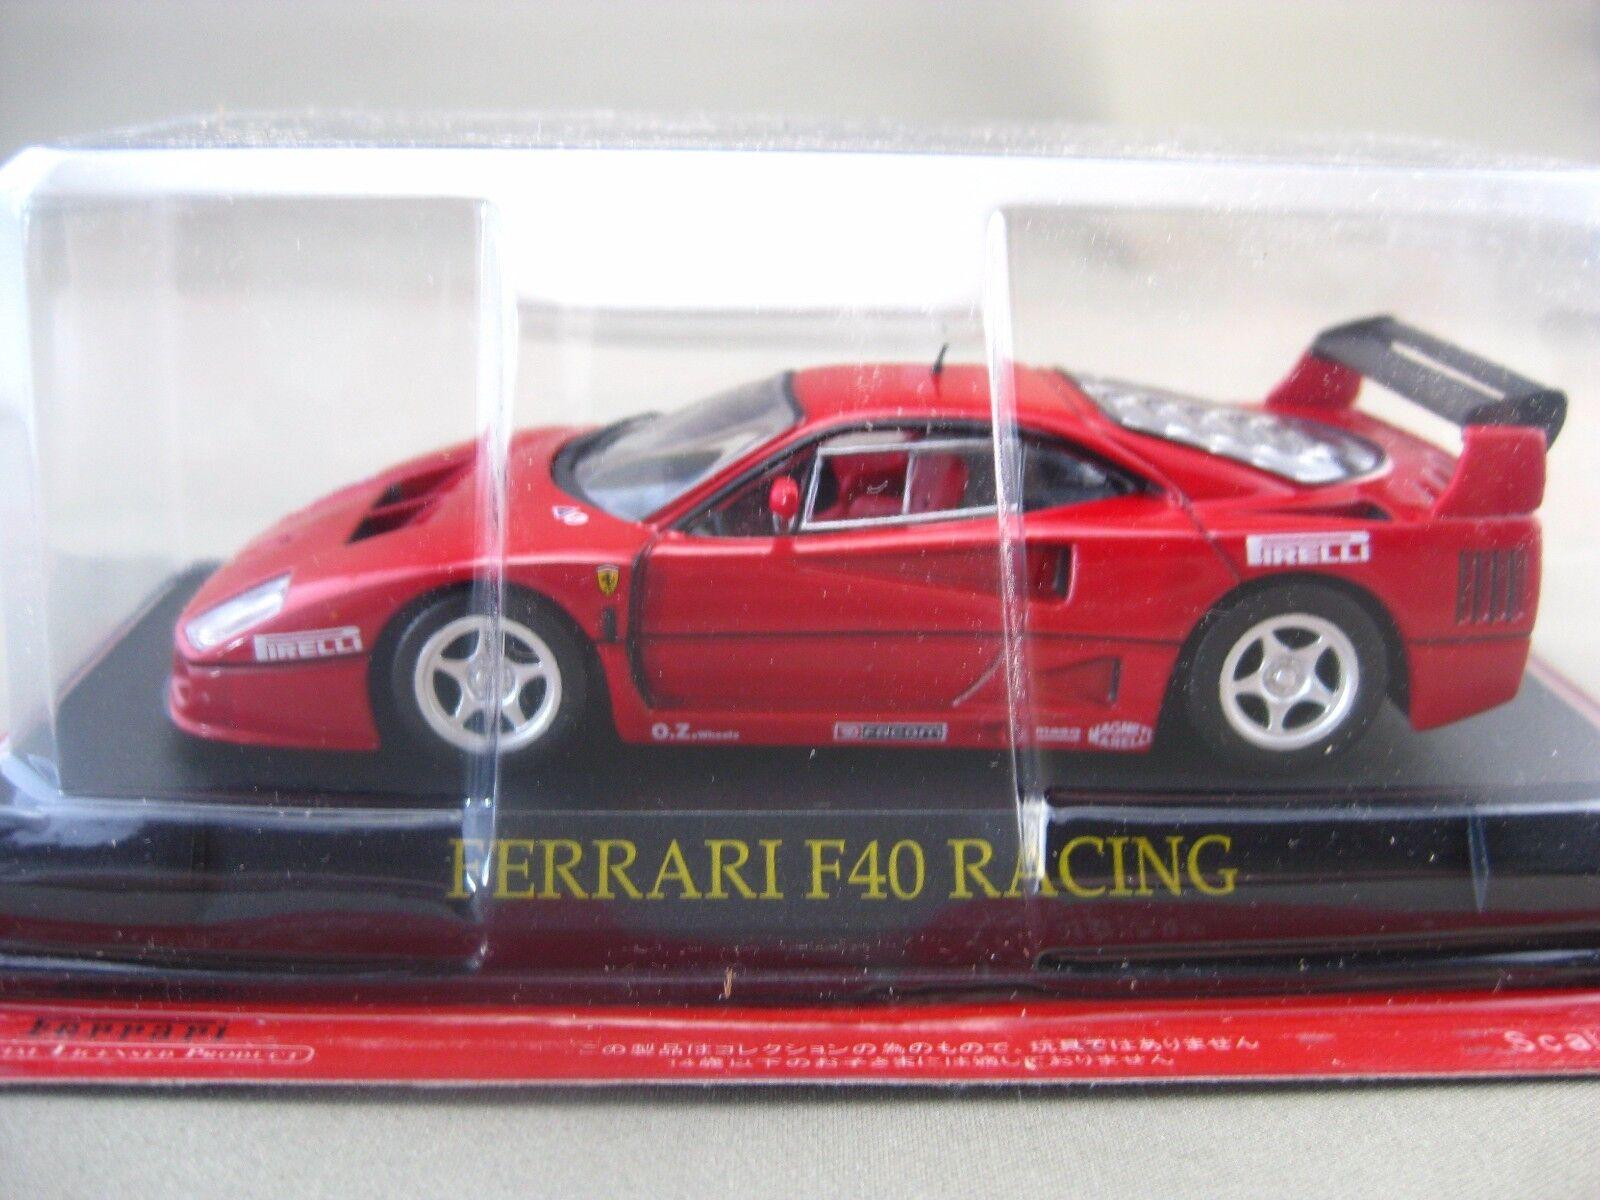 Ferrari  F40 RACING hachette 1 43 Diecast car Vol.40